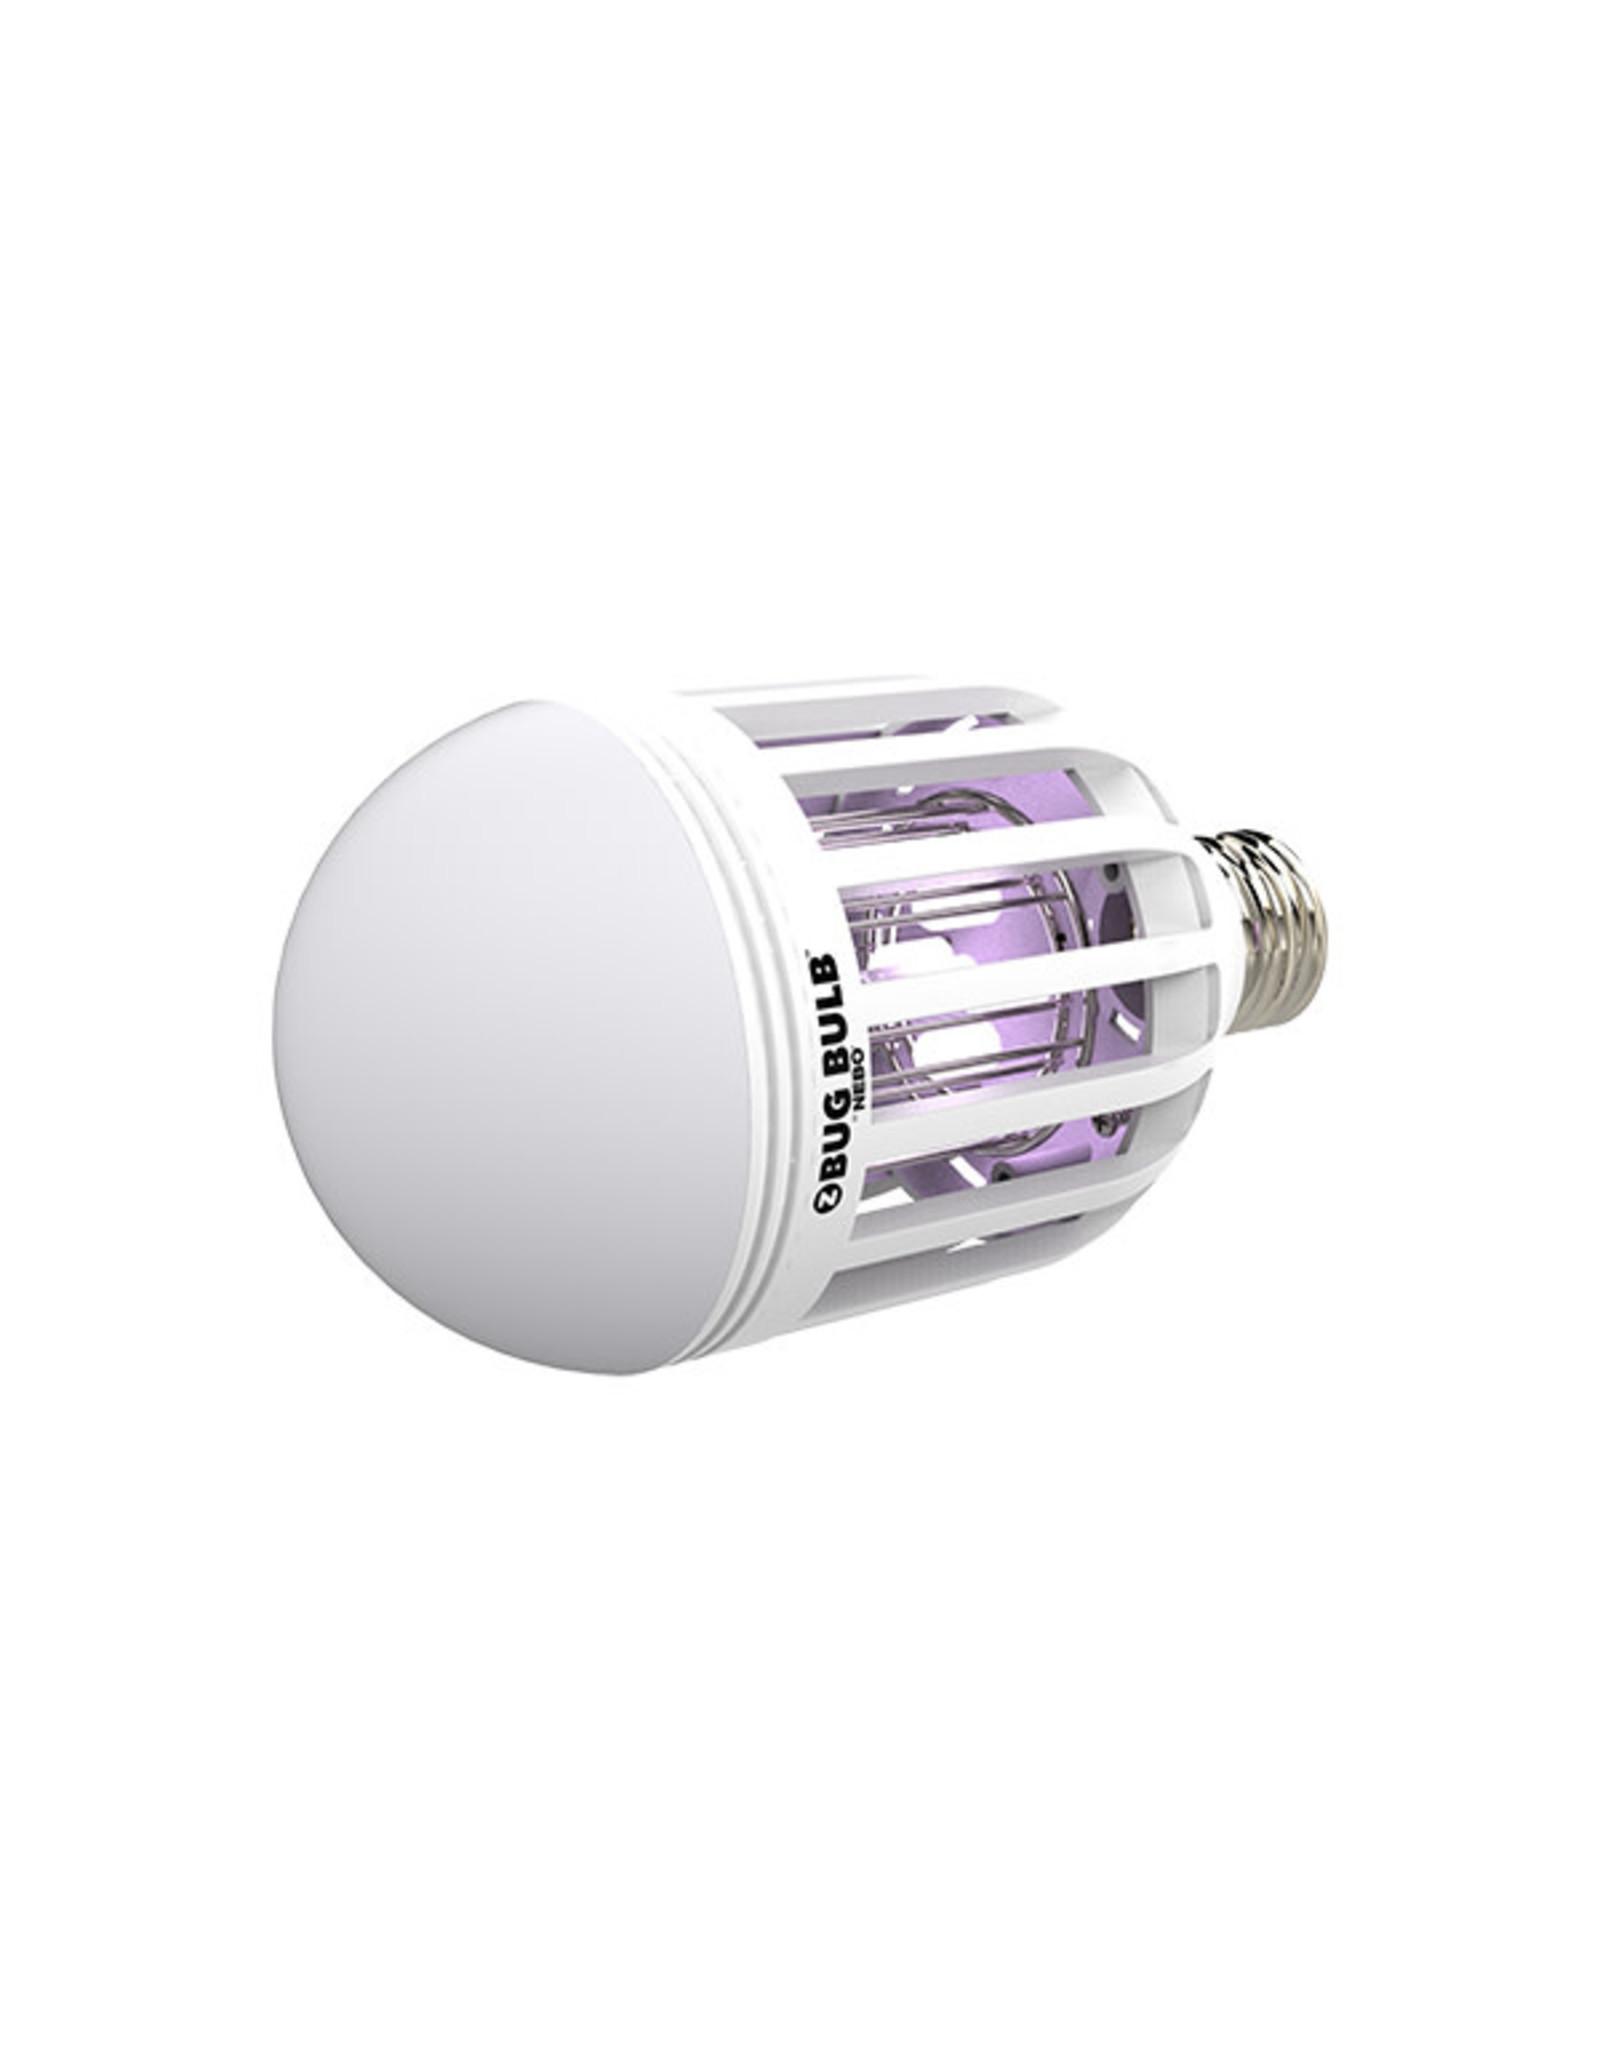 Z-Bug Bulb